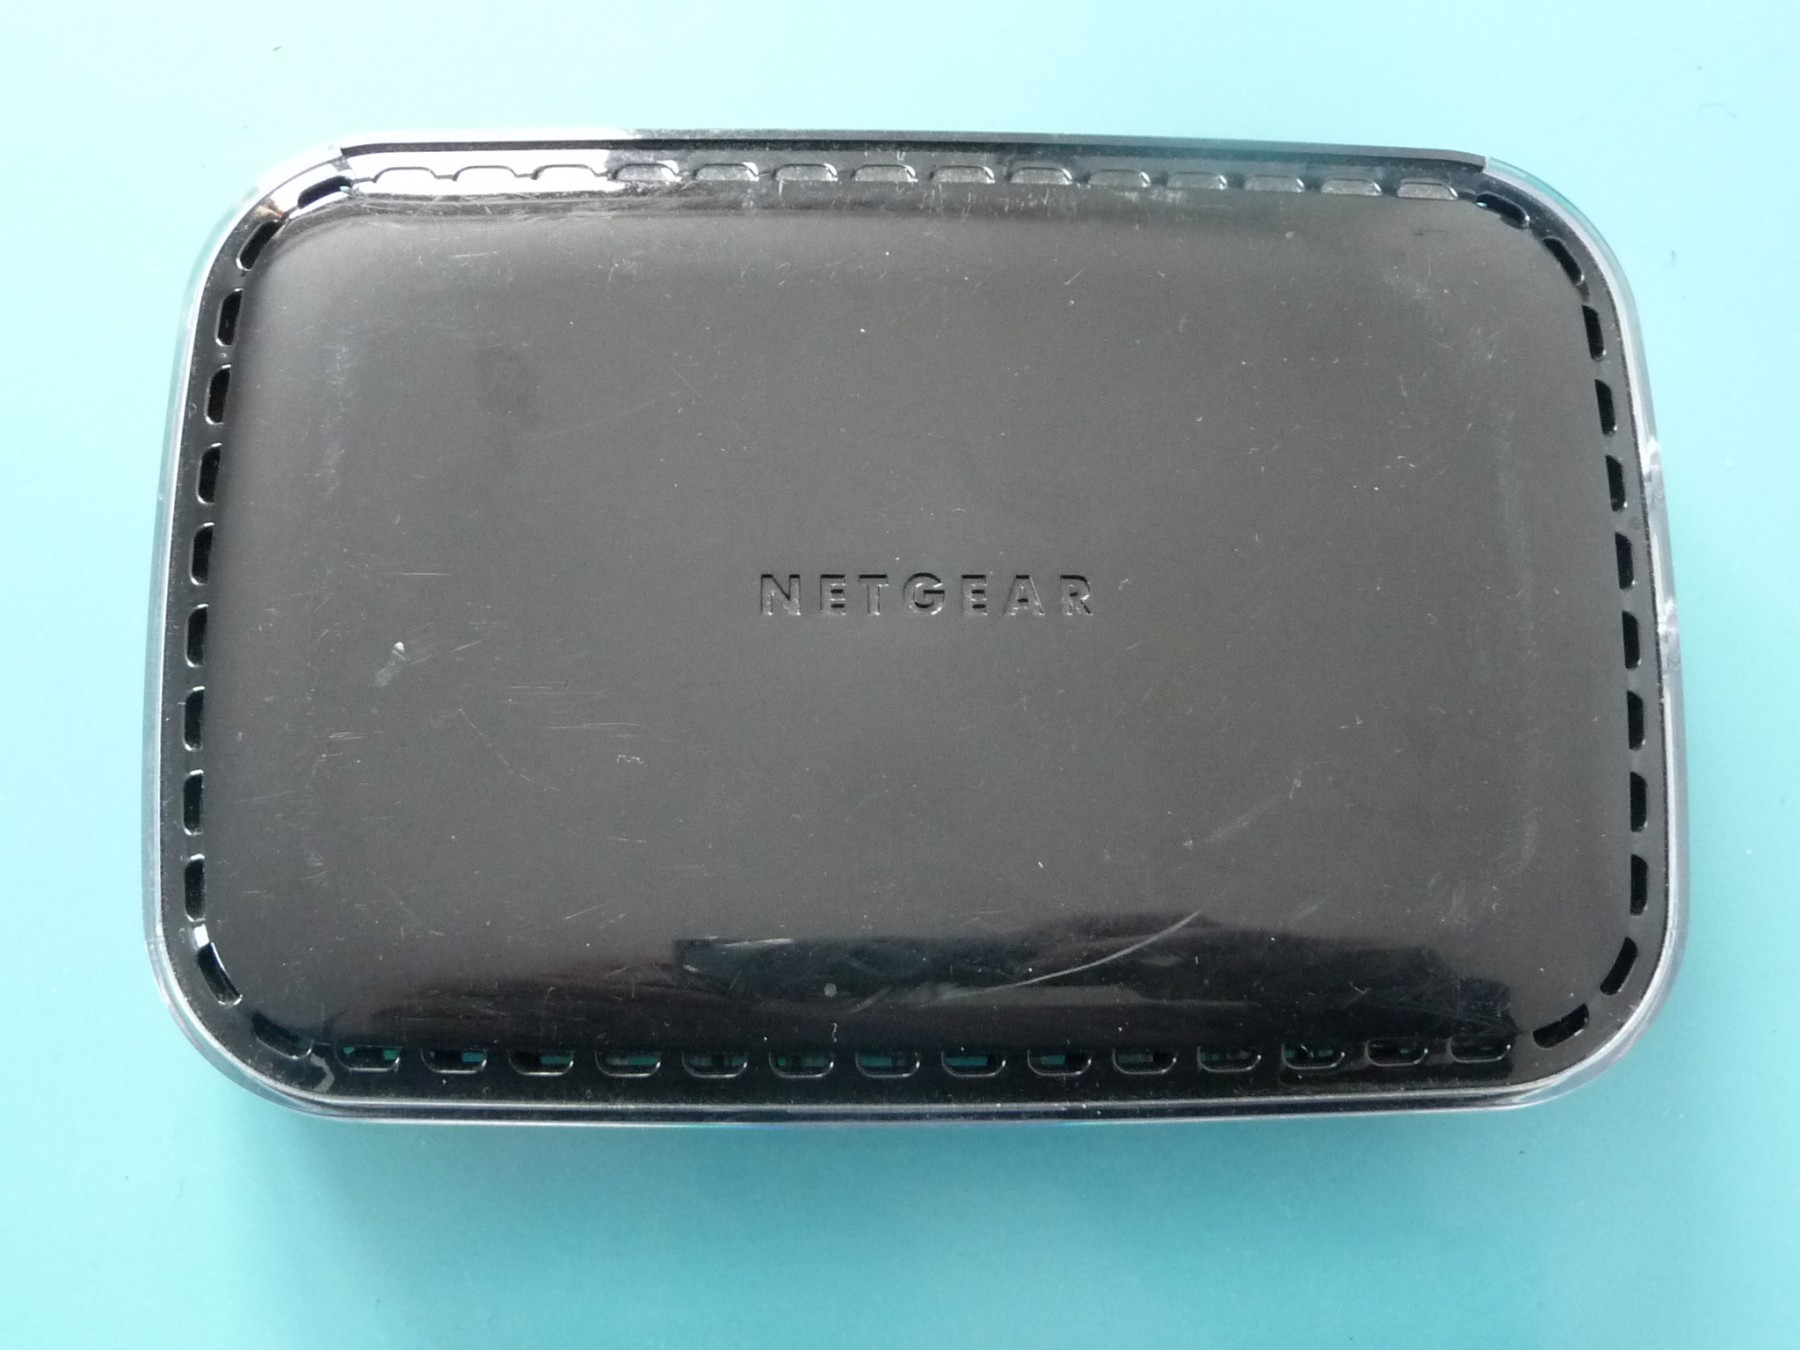 Netgear WNR1000 Rangemax N150 N Wireless Router - Kupindo ... - photo#11